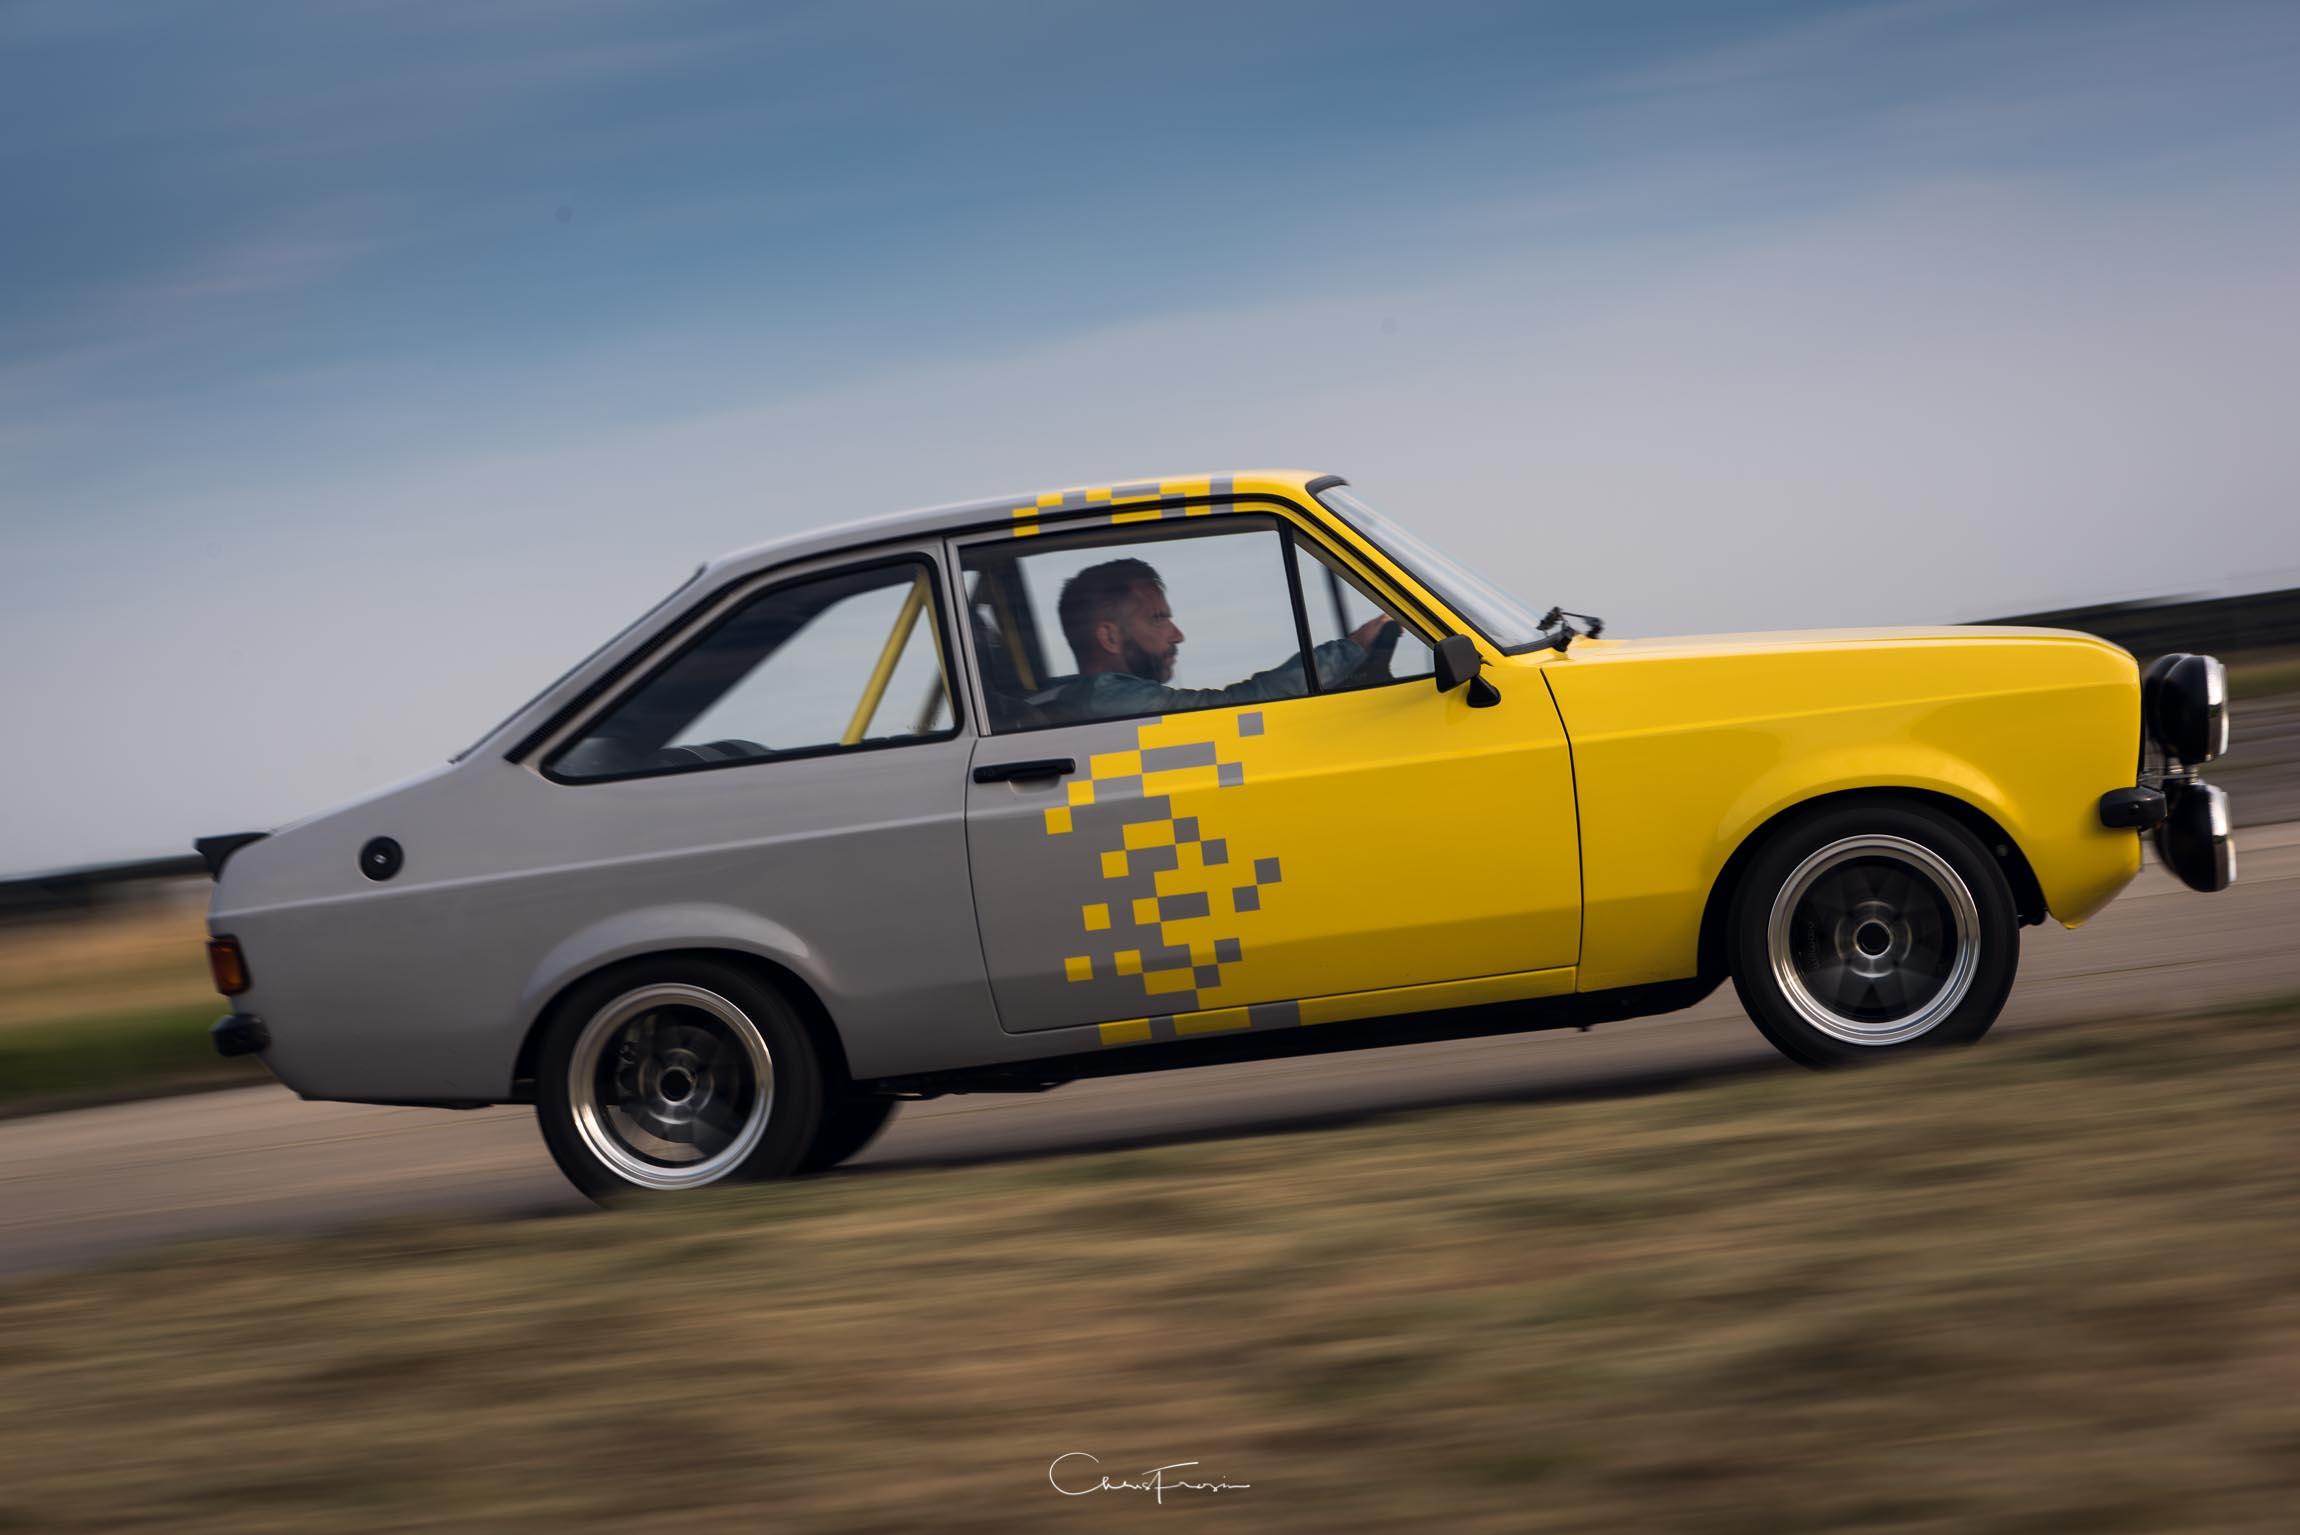 customcars-gwg-goblinworksgarage-goblinworks-antpartridge-partridgedesign-custommotorcycles-goblins-helenstanley-jimmydeville-goblinescort-mk2escort-customescort-rallycar-fastford-classicford-customford.png